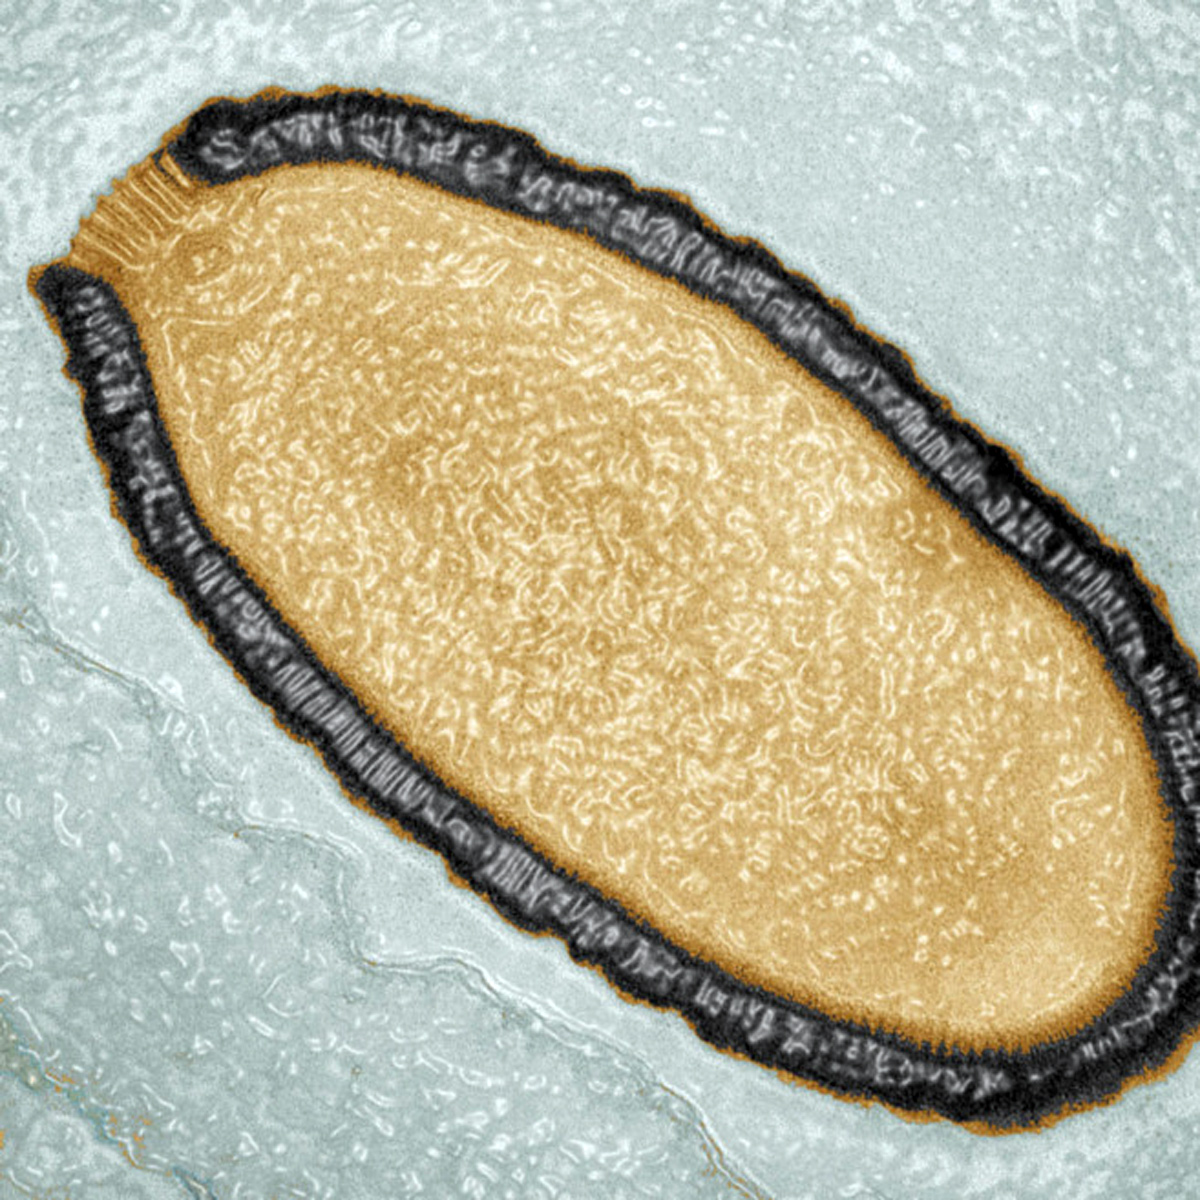 virus-de-30000-anos